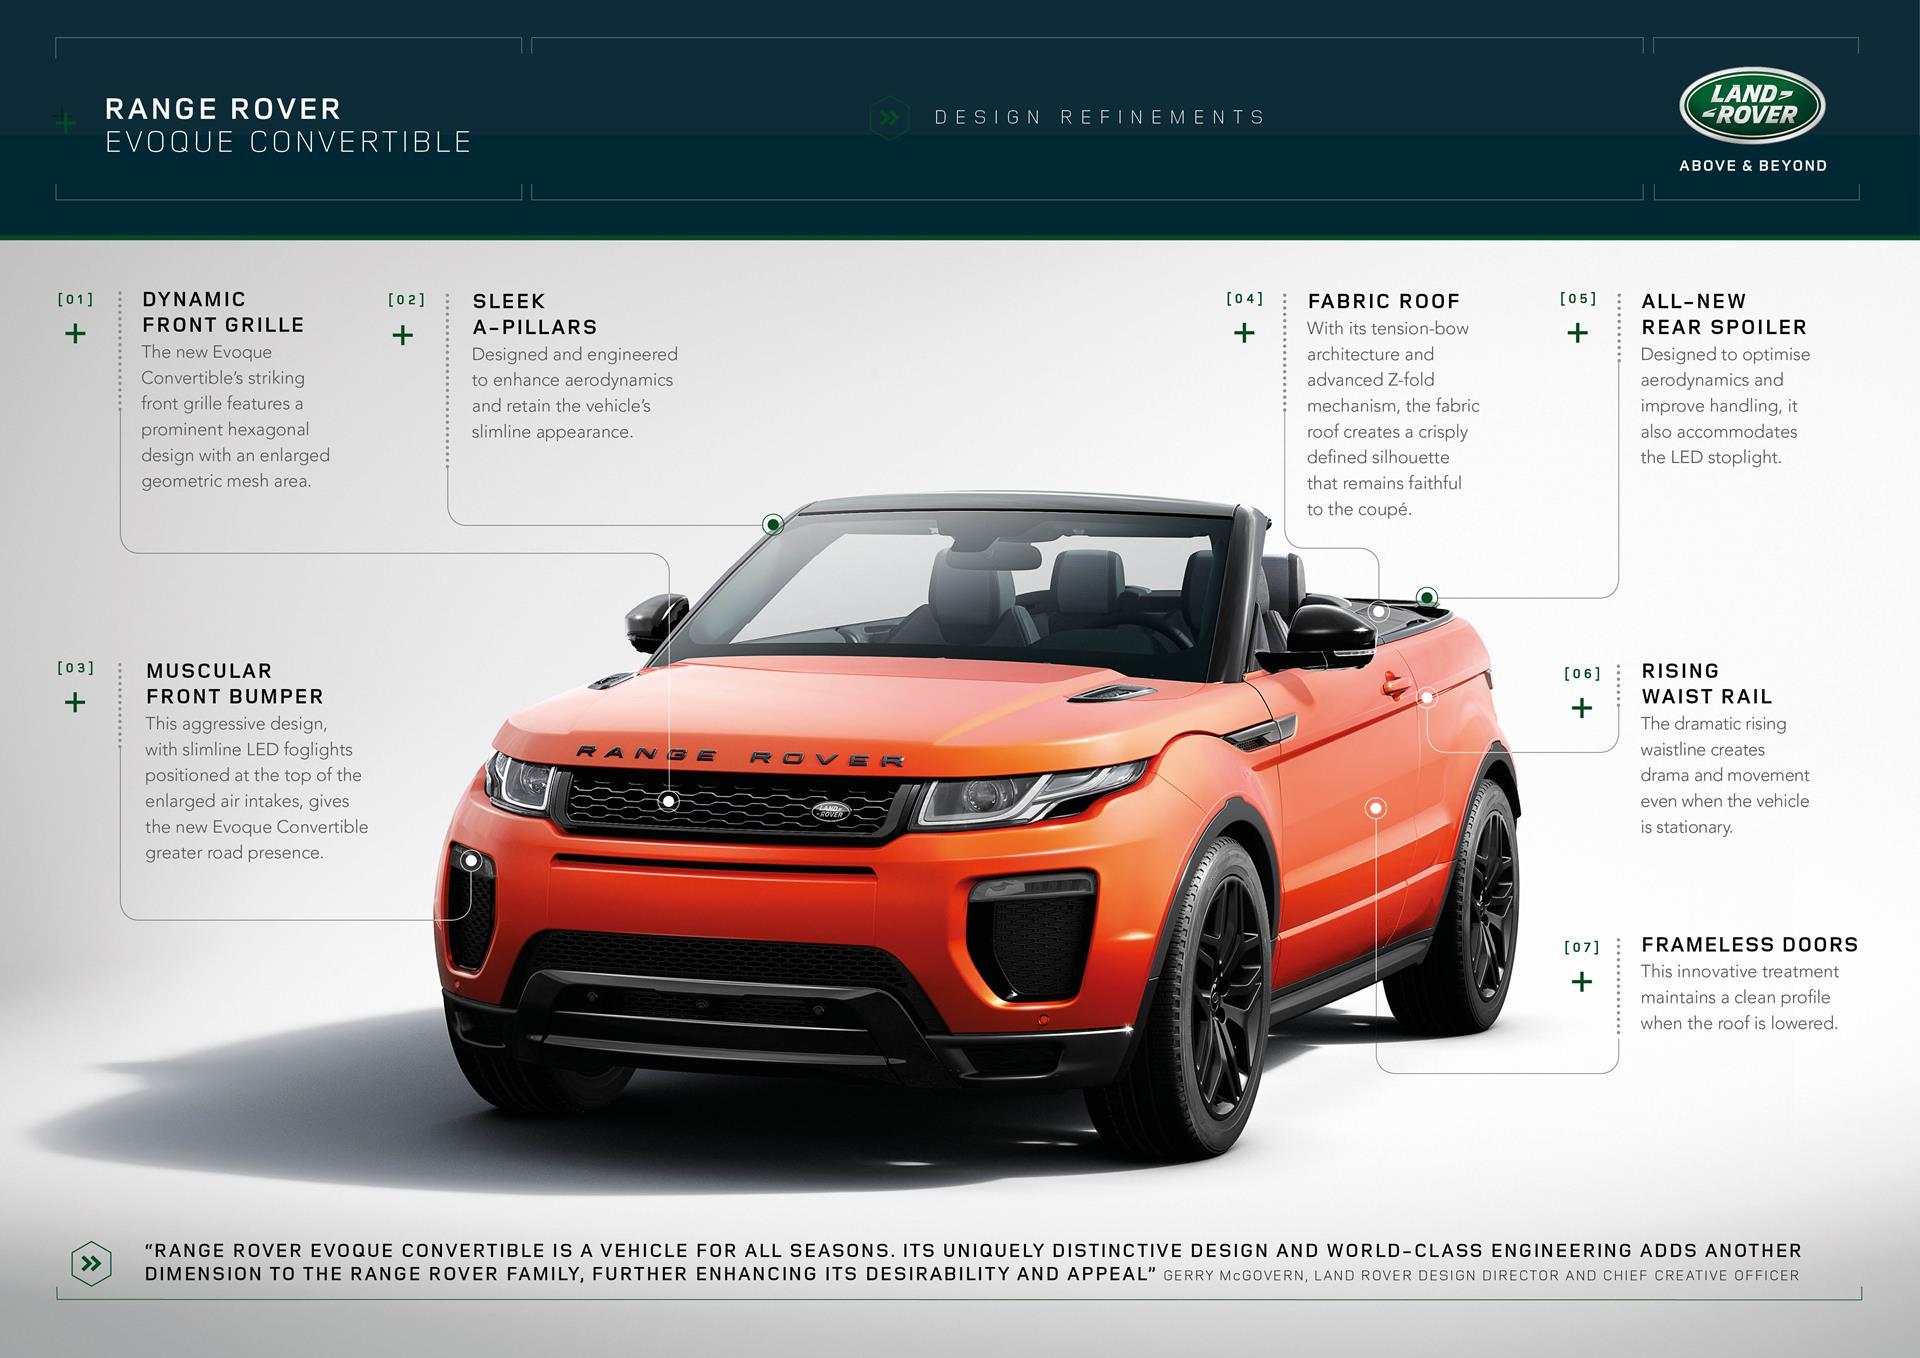 2016 land rover range rover evoque convertible technical. Black Bedroom Furniture Sets. Home Design Ideas